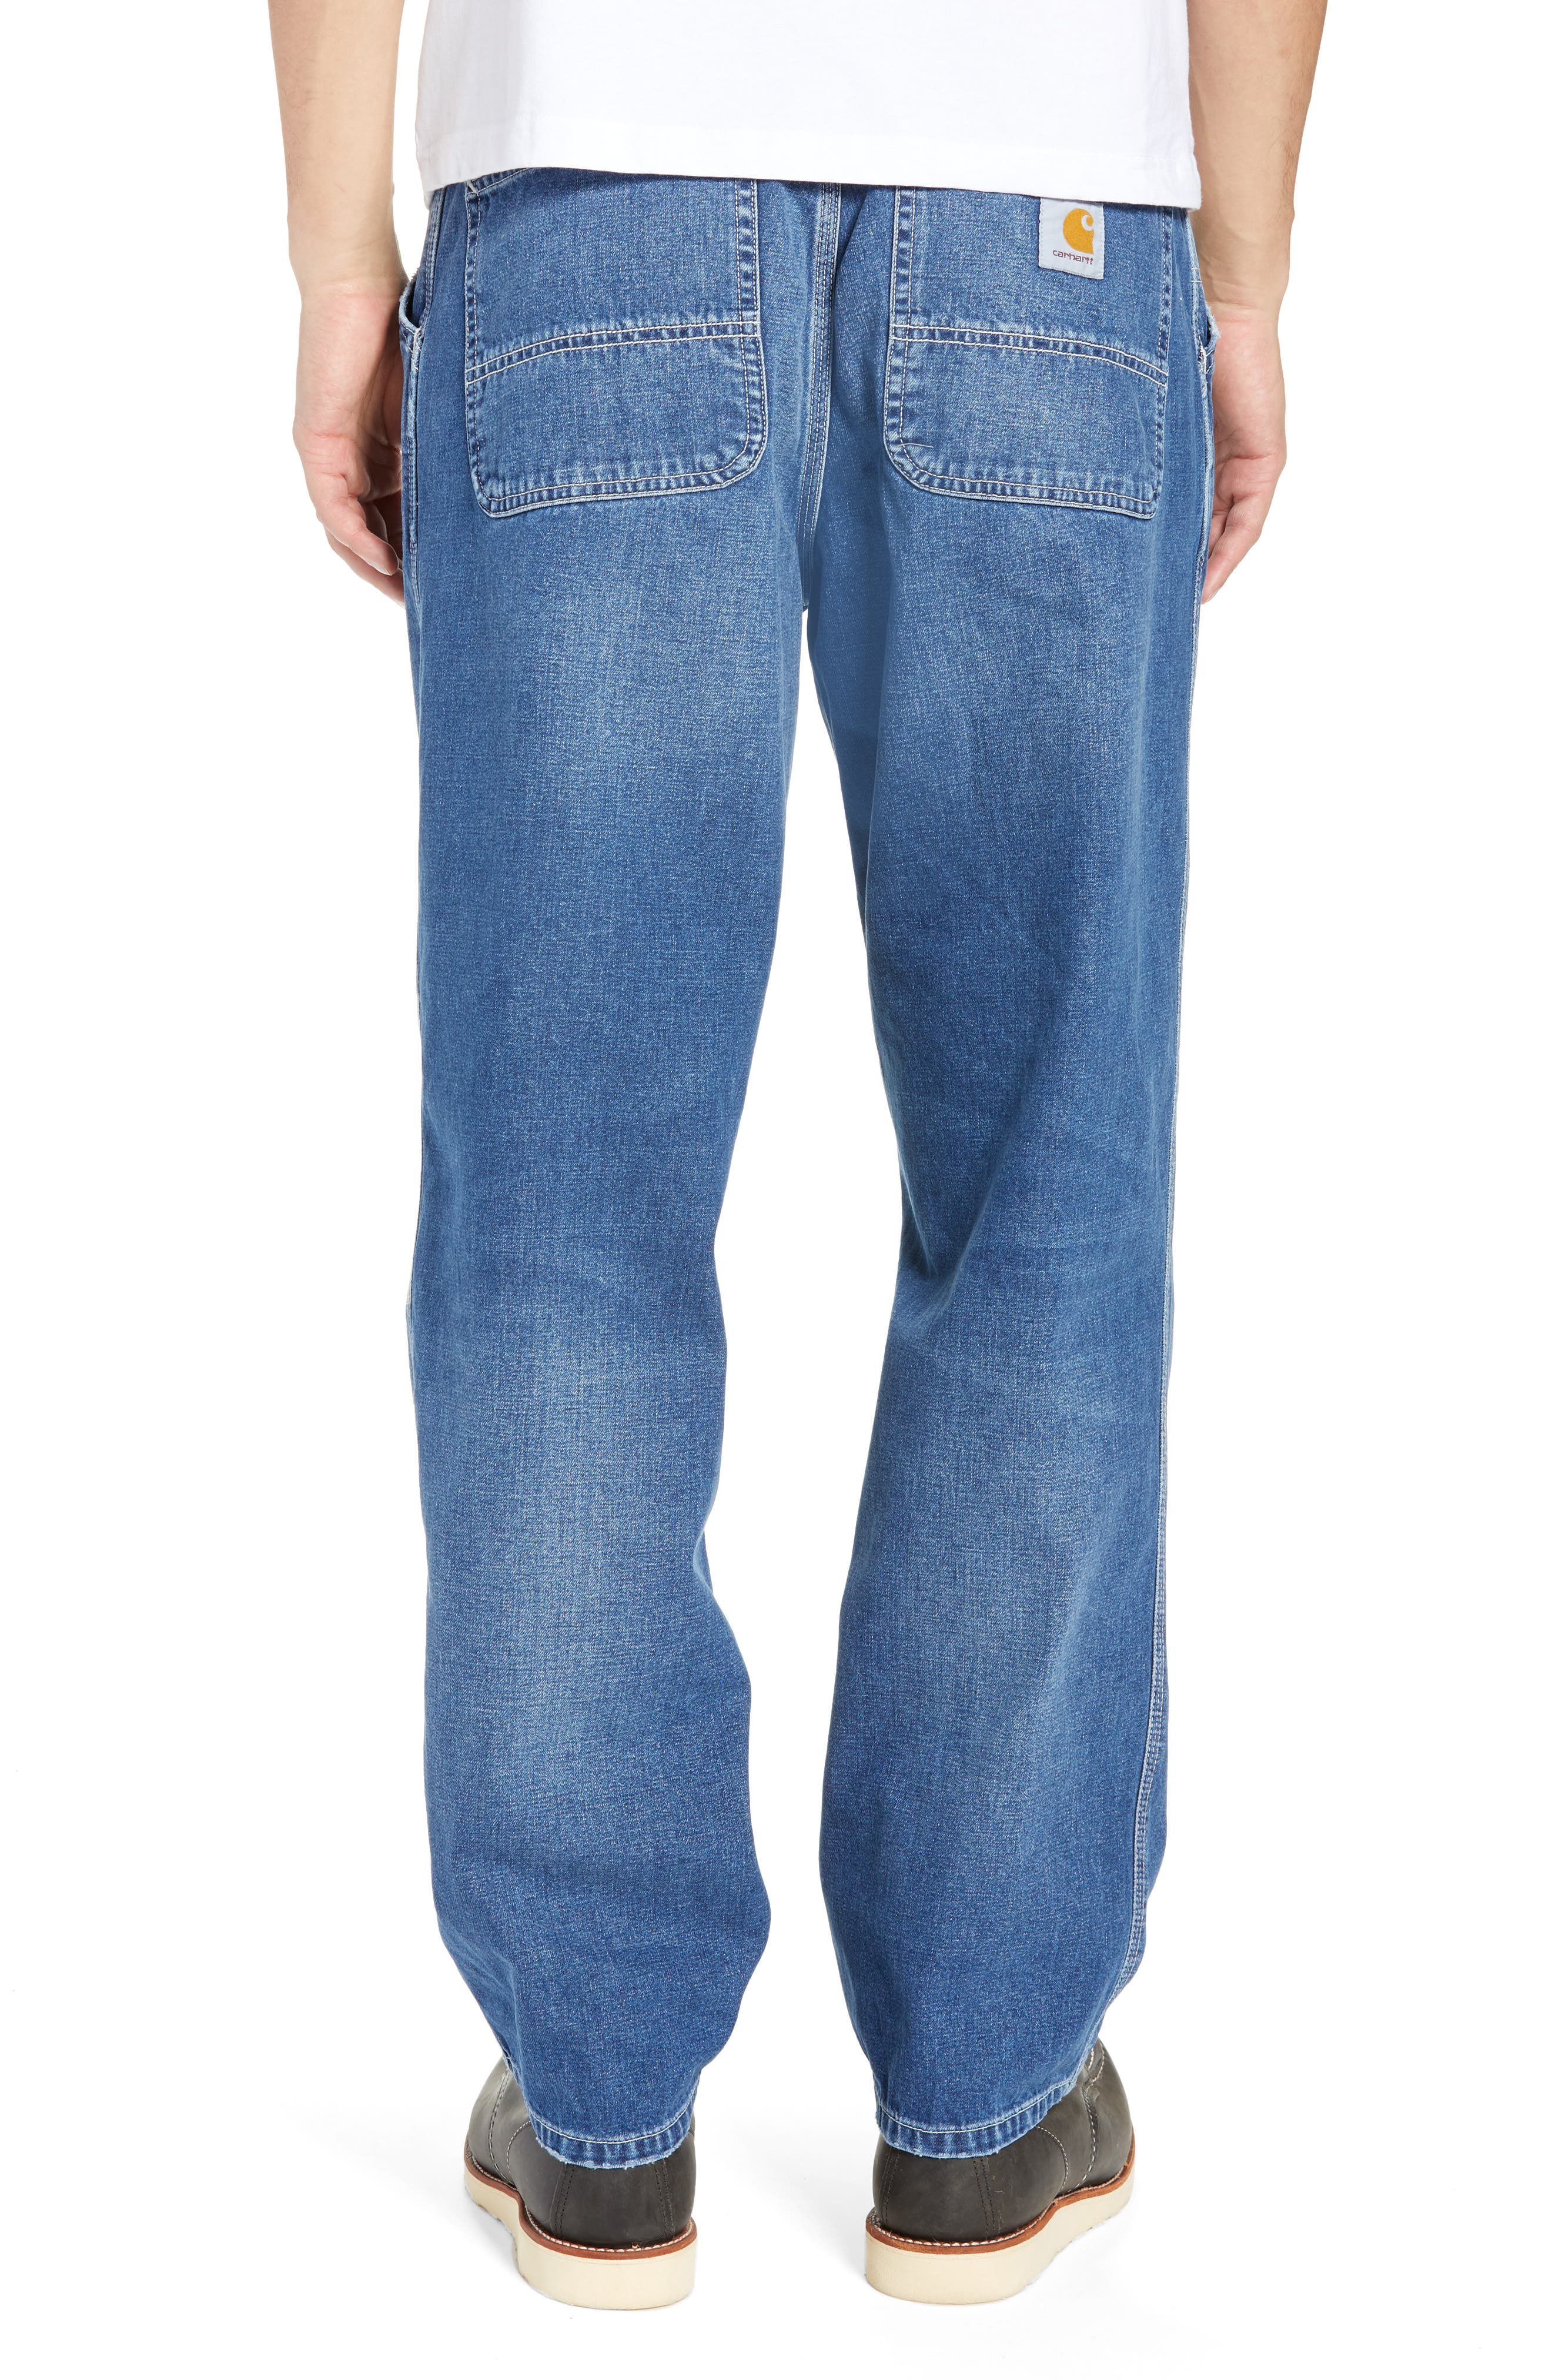 CARHARTT WORK IN PROGRESS,                             Simple Denim Jeans,                             Alternate thumbnail 2, color,                             BLUE